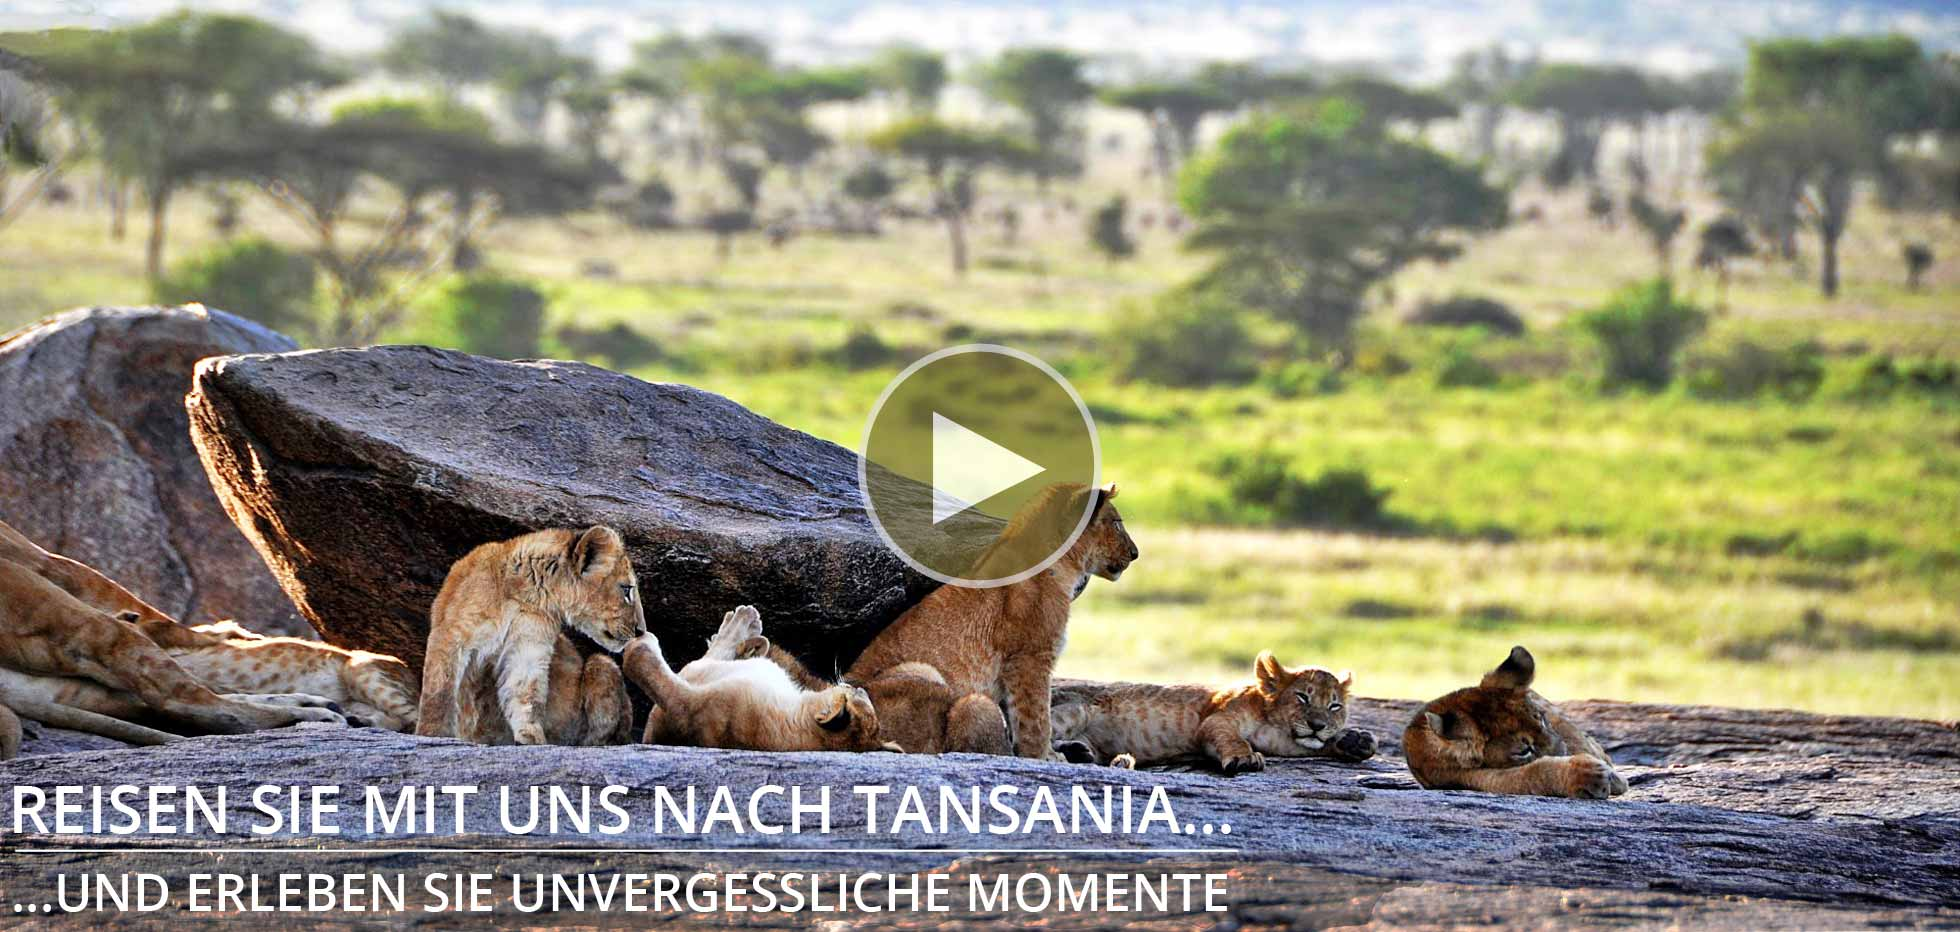 Promo Video Tanzania-Experience